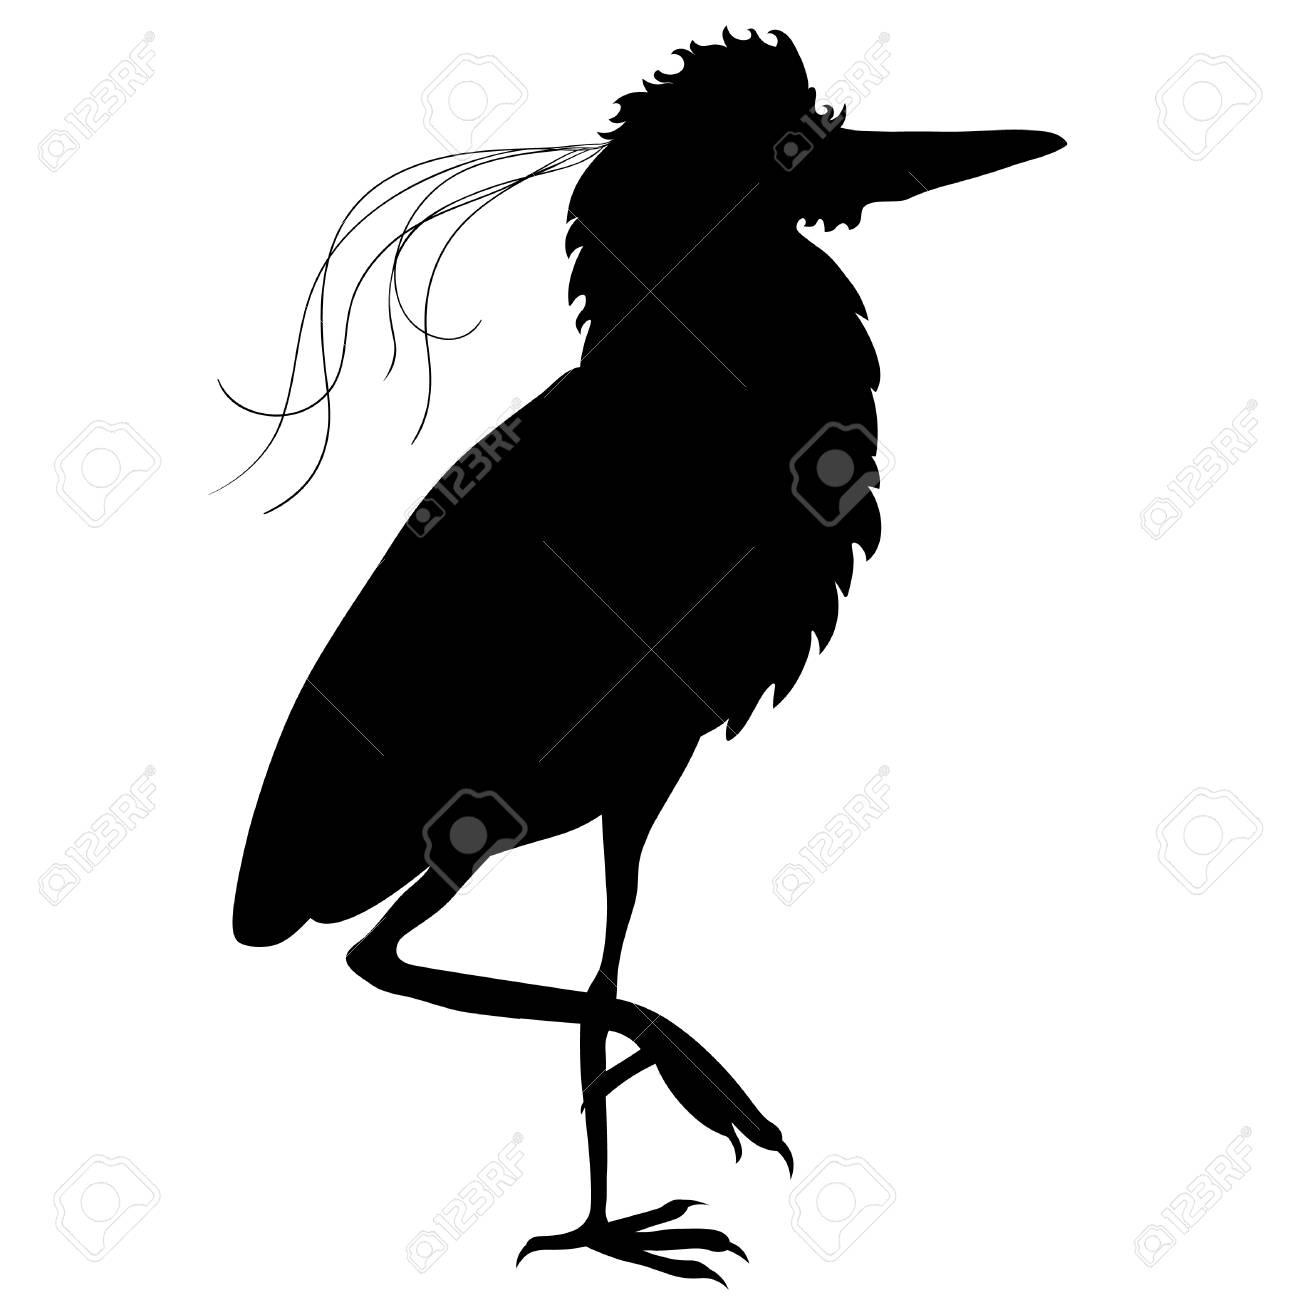 silhouette south american kvakva heron bird vector illustration